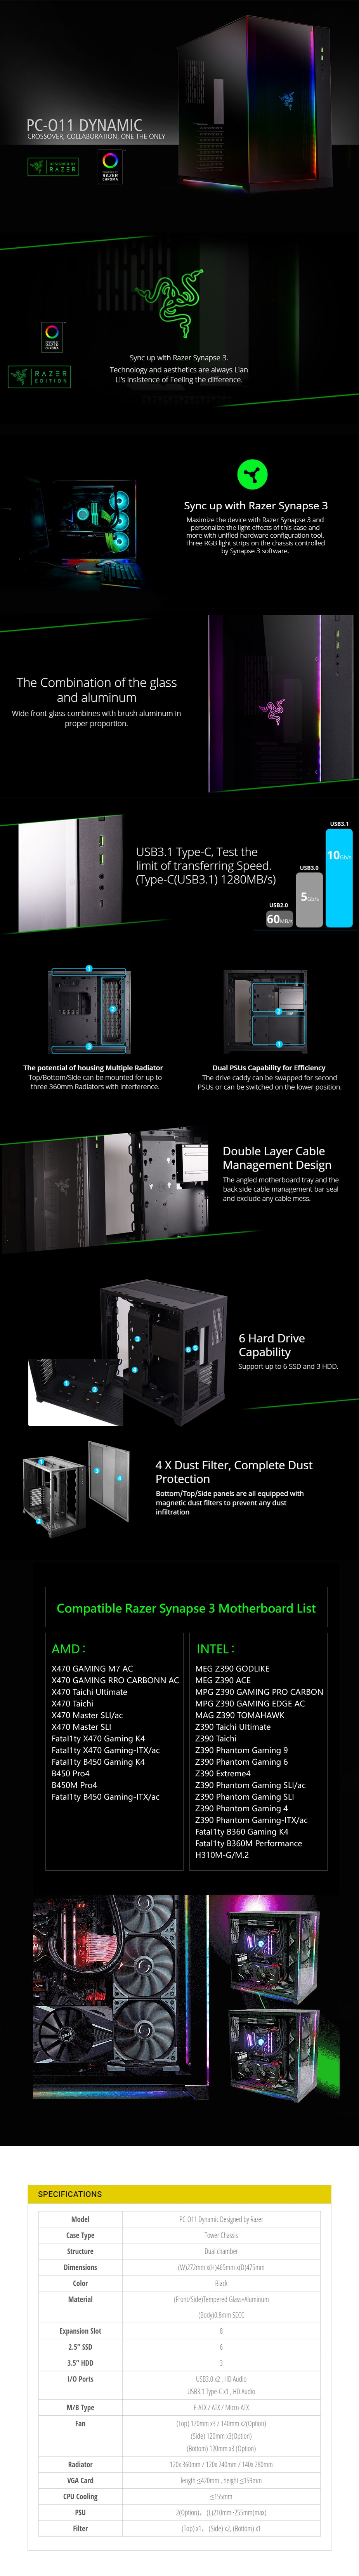 Lian-Li PC-011 Dynamic RGB Tempered Glass Mid Tower Case - Razer Edition